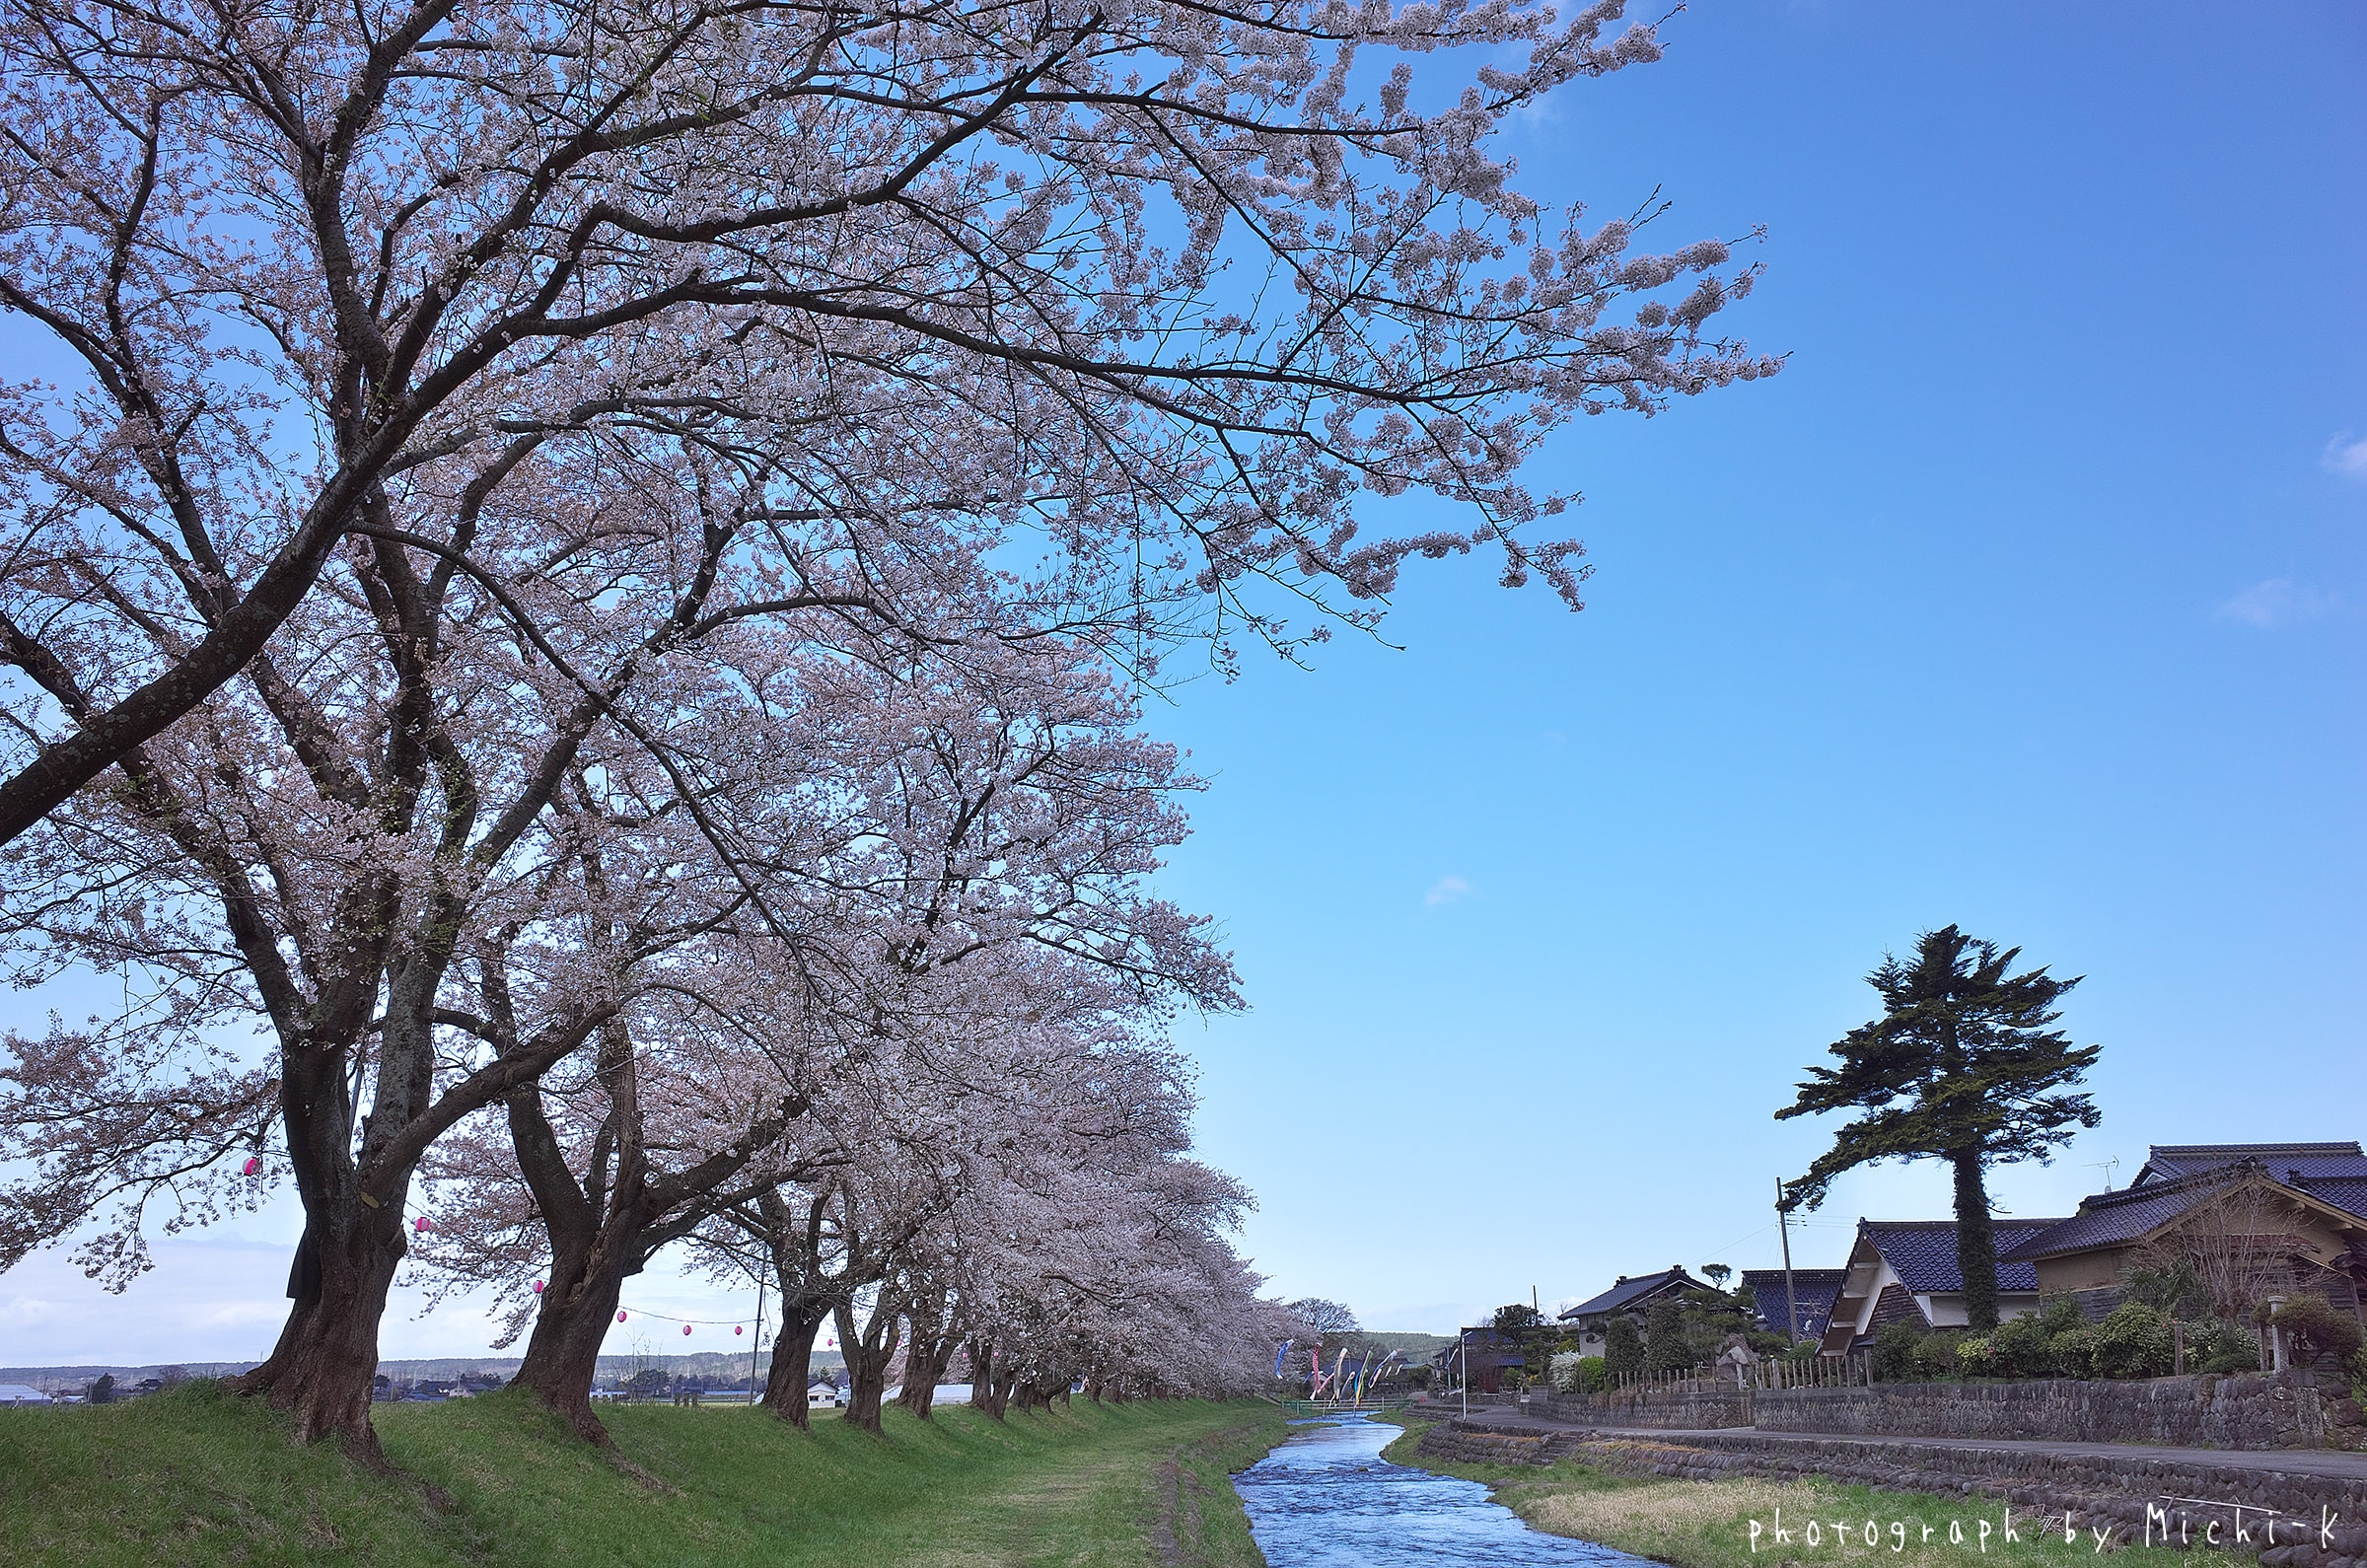 2017山形県遊佐町、中山河川公園の桜No.4